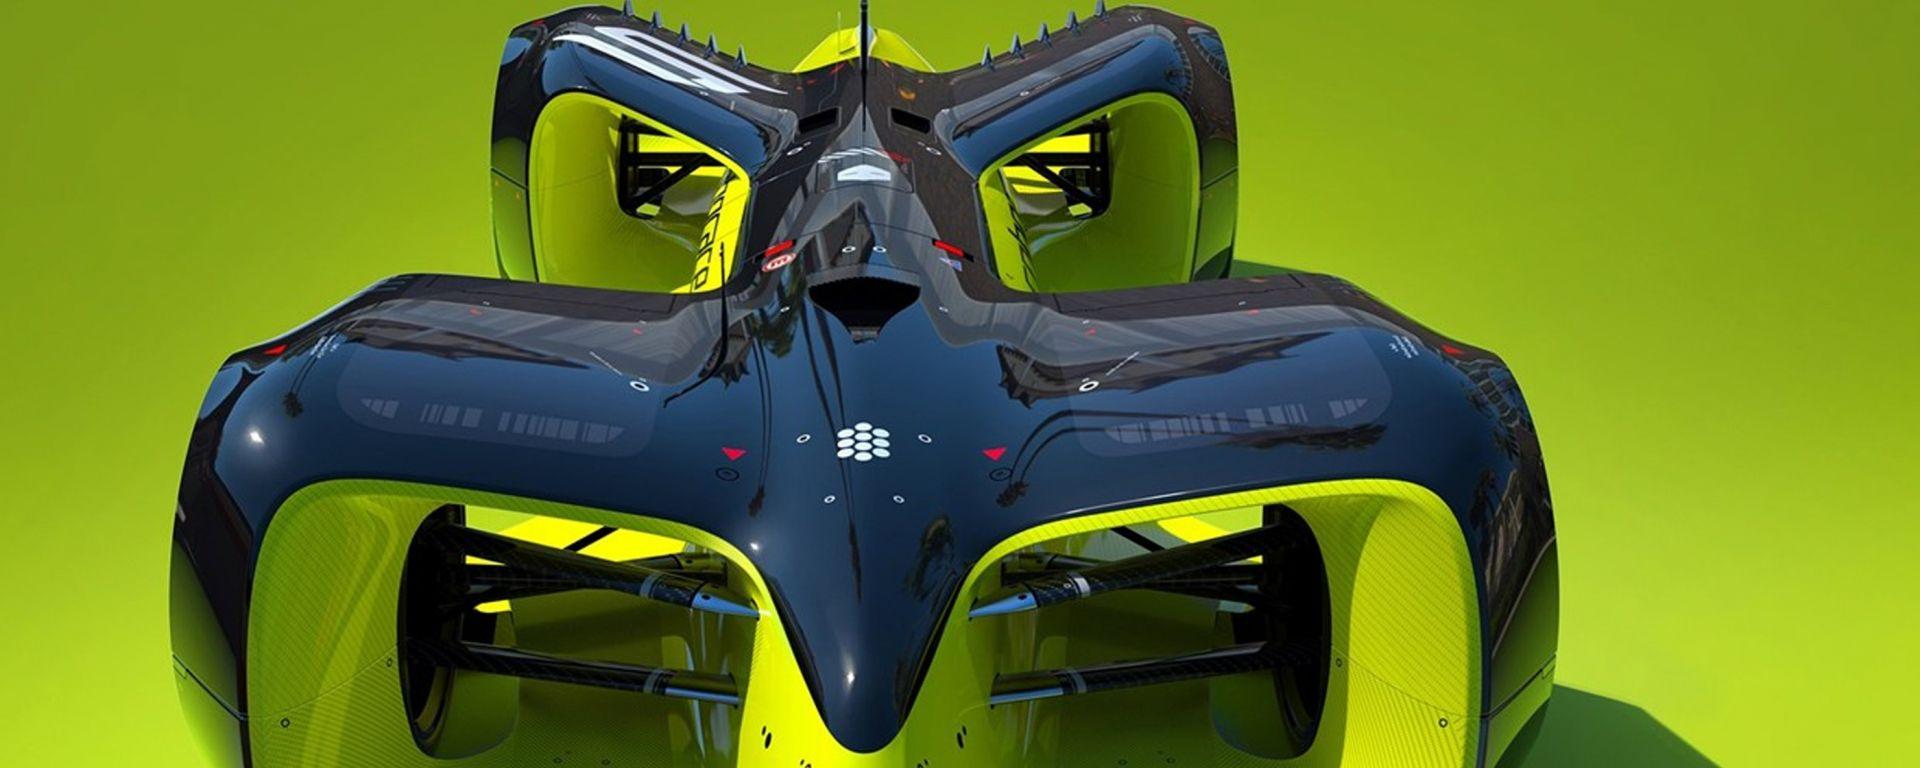 Roborace: la Formula 1 a guida autonoma